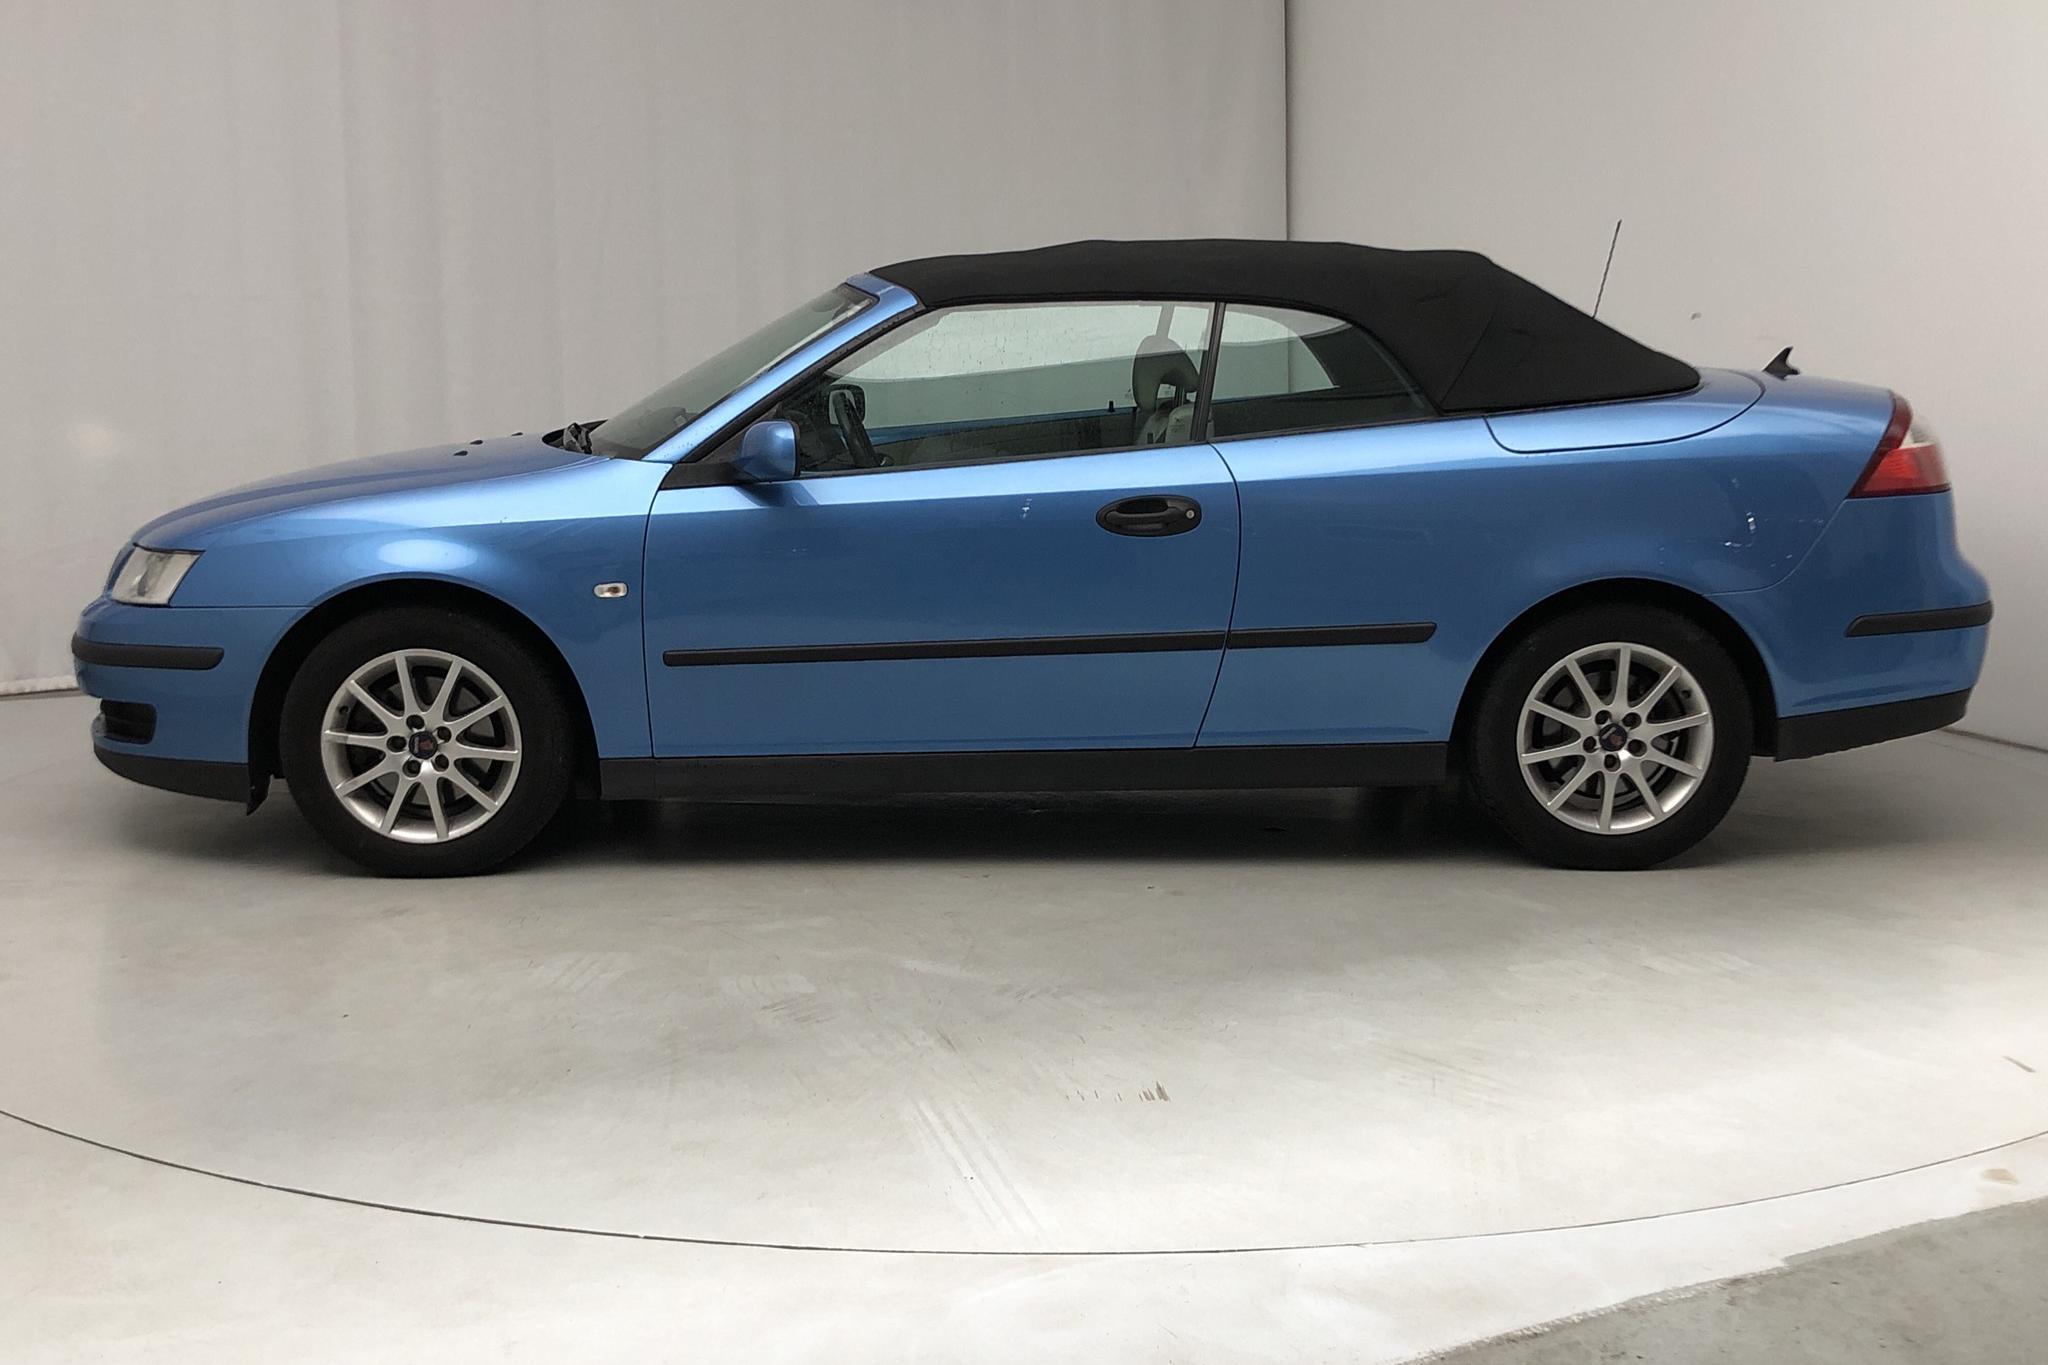 Saab 9-3 1.8t Cabriolet (150hk) - 172 280 km - Automatic - Light Blue - 2006